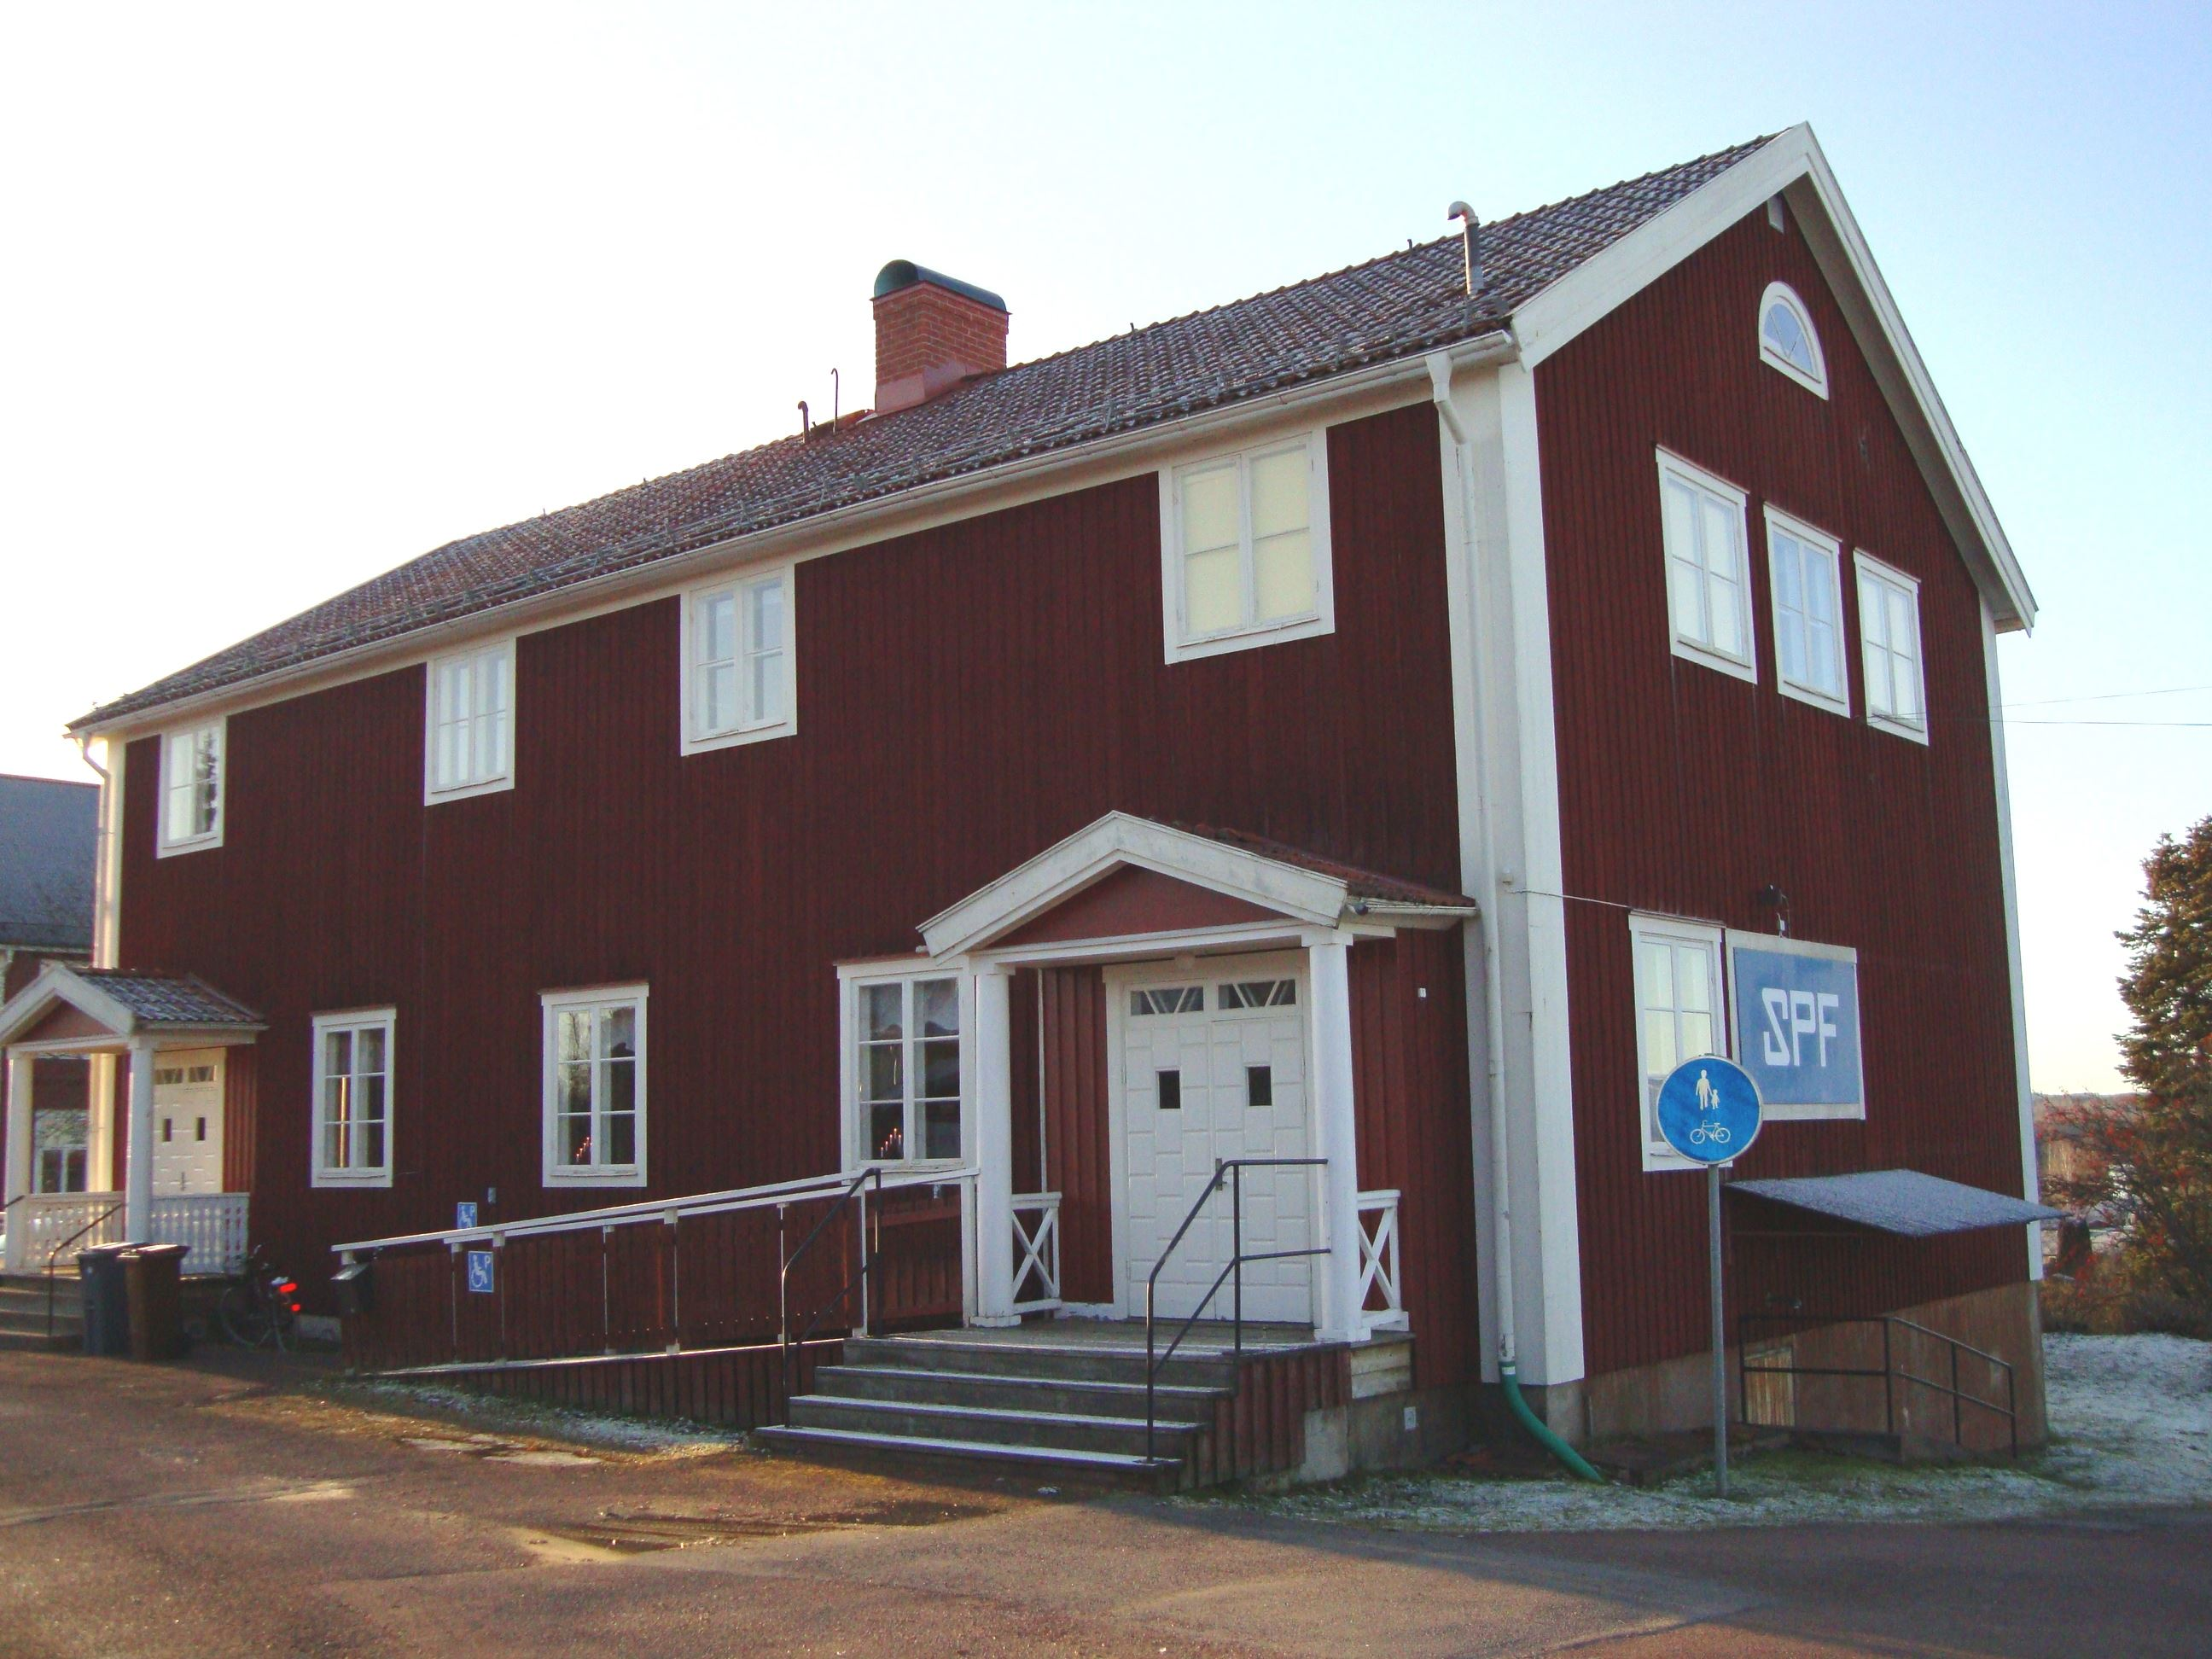 SPF, old school, Mora-Noret, Mora